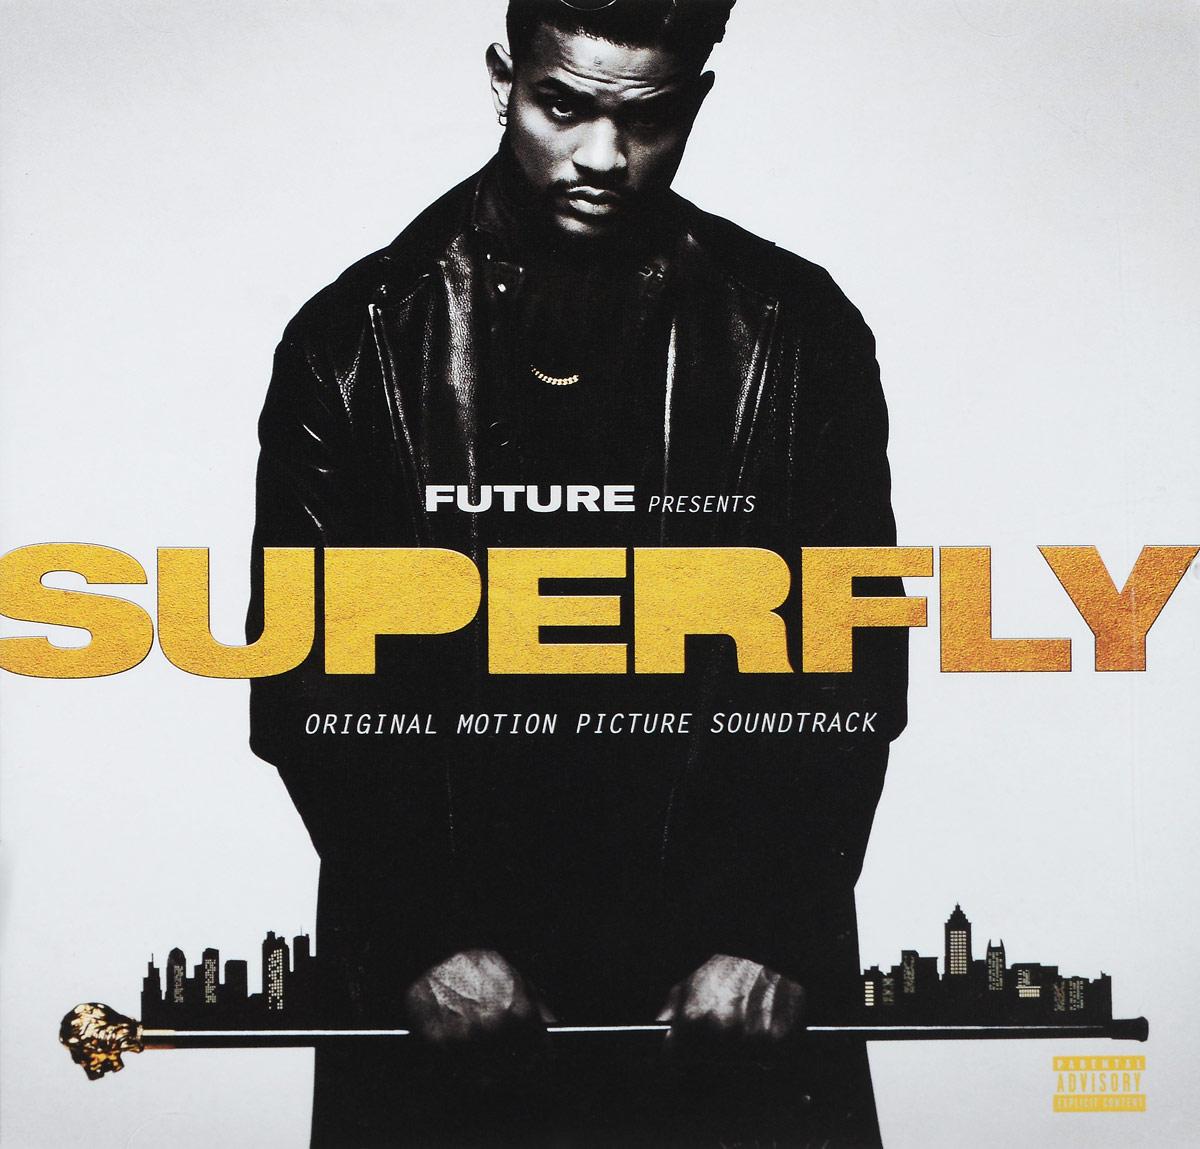 Future,Лил Вэйн Future & Lil Wayne. Superfly. OST лил вэйн lil wayne i am not a human being ii